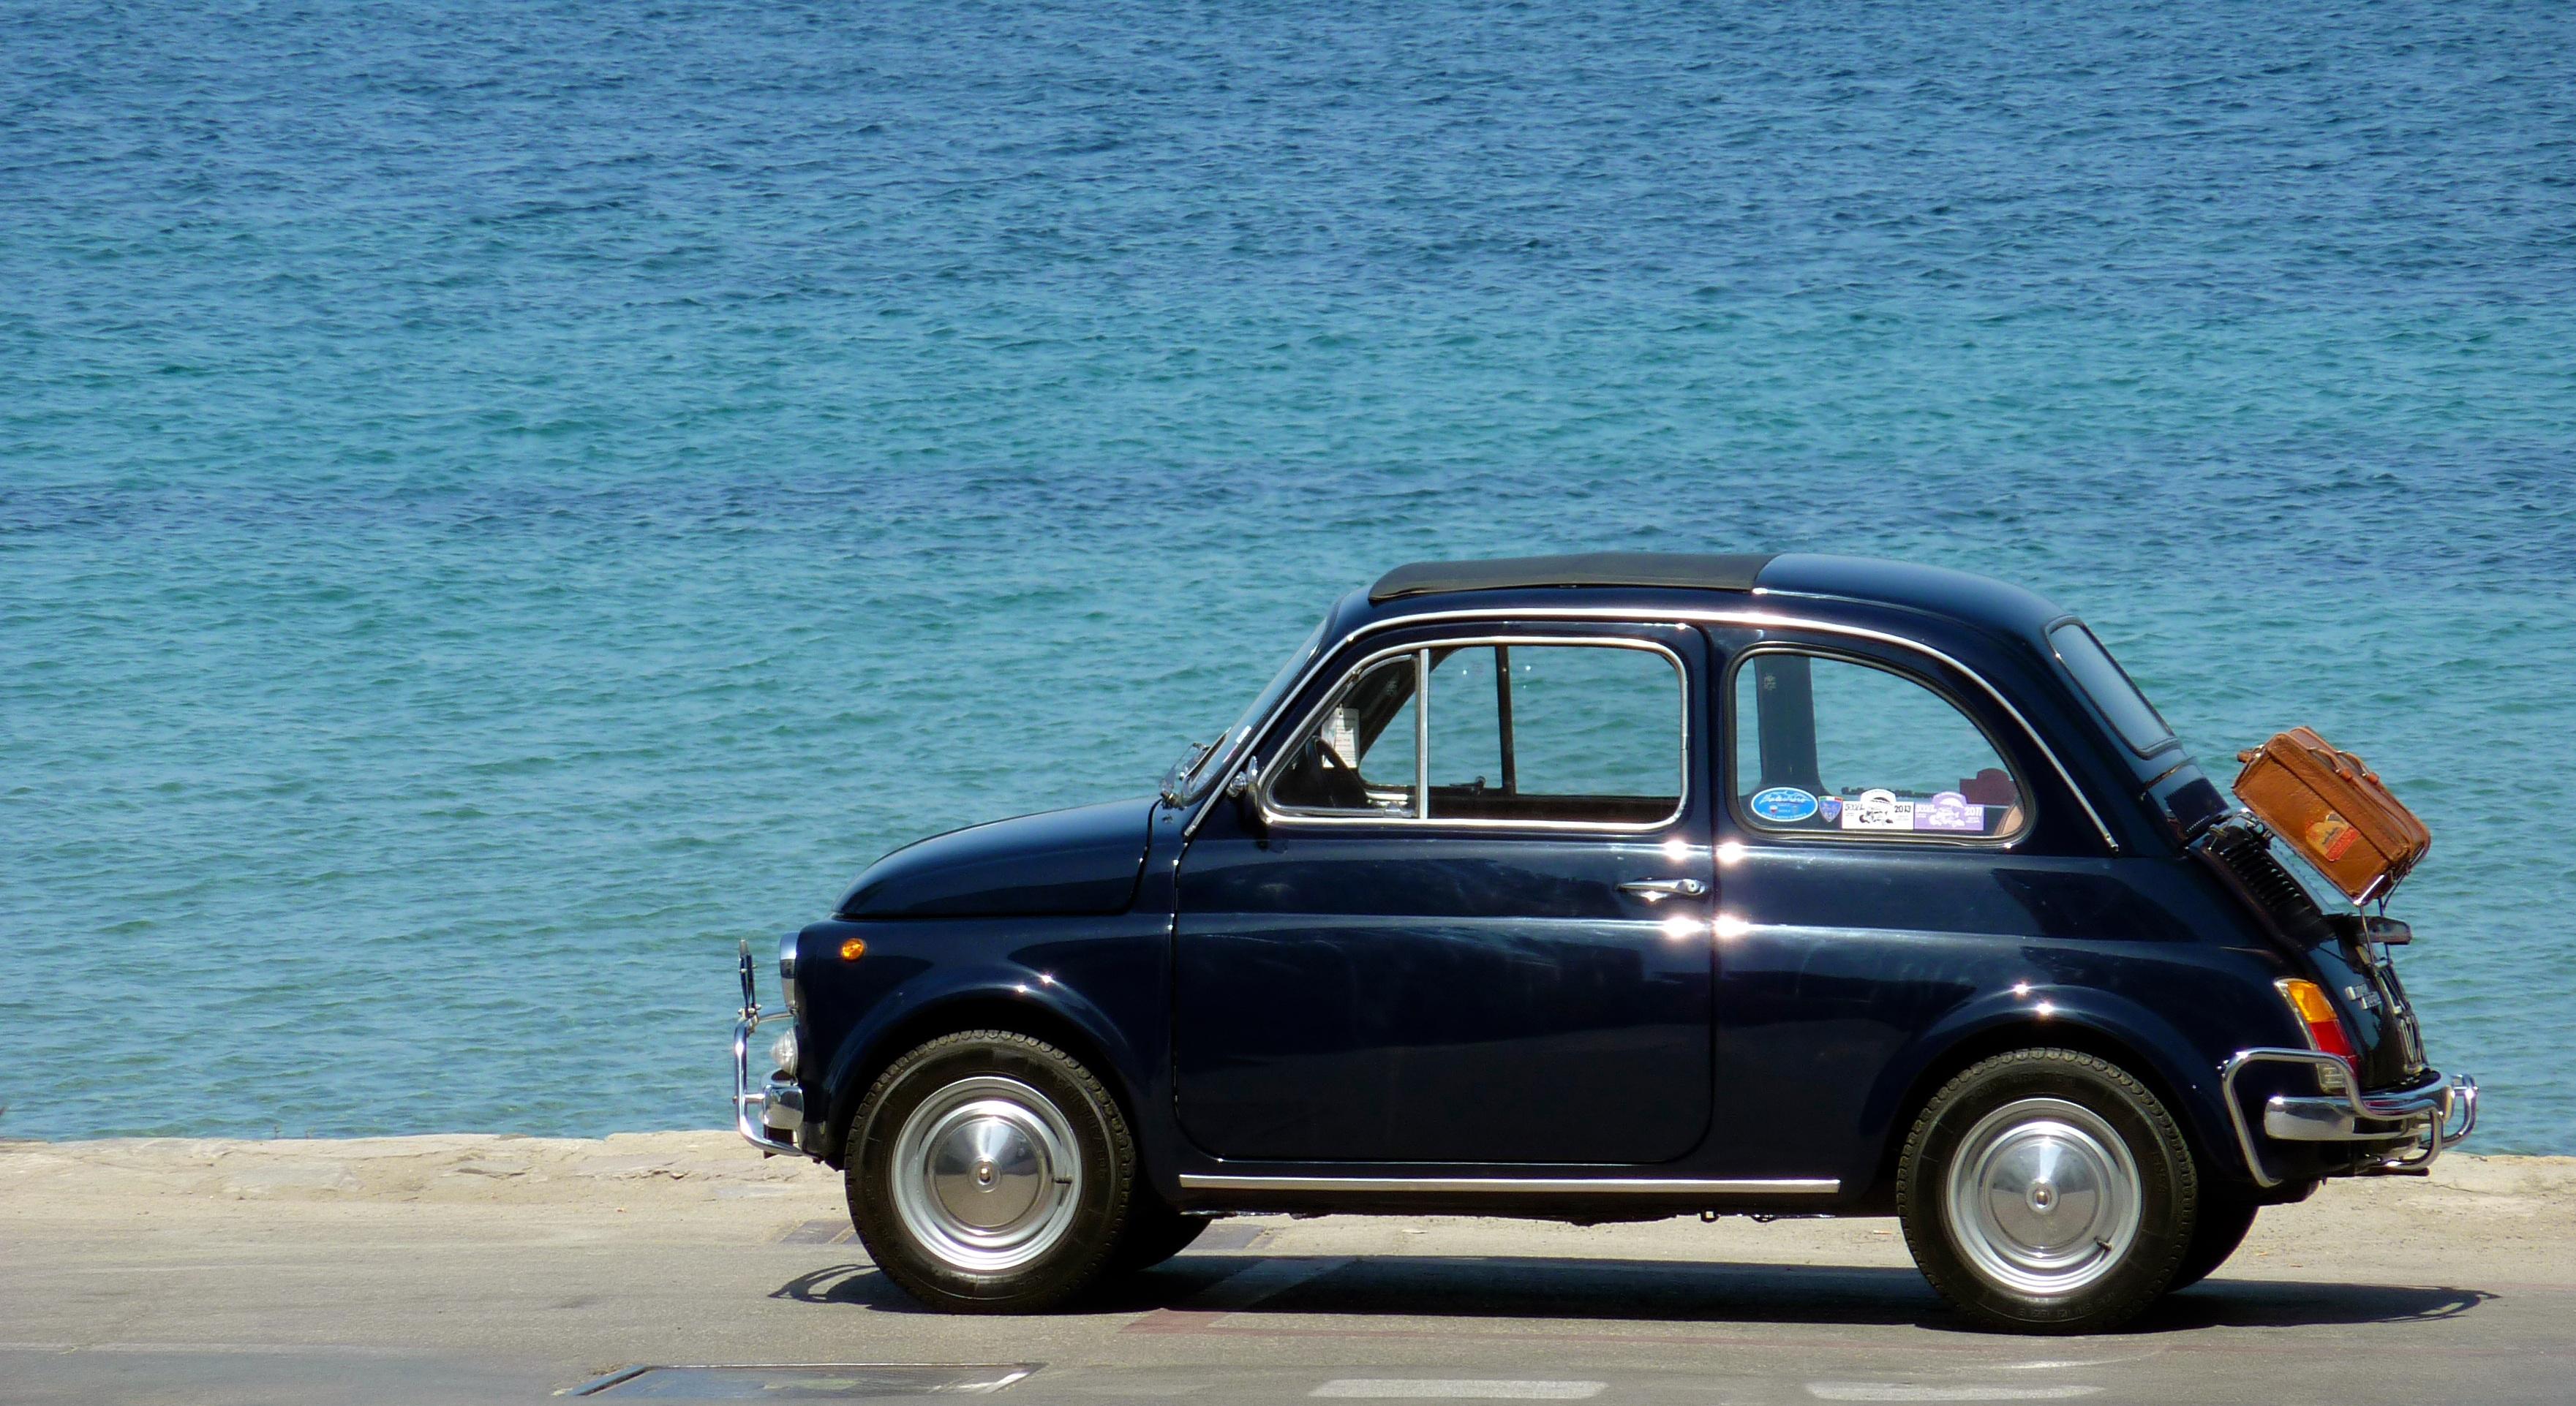 Kostenlose foto : Meer, Rad, alt, Fahrzeug, Park, Italien, blau ...